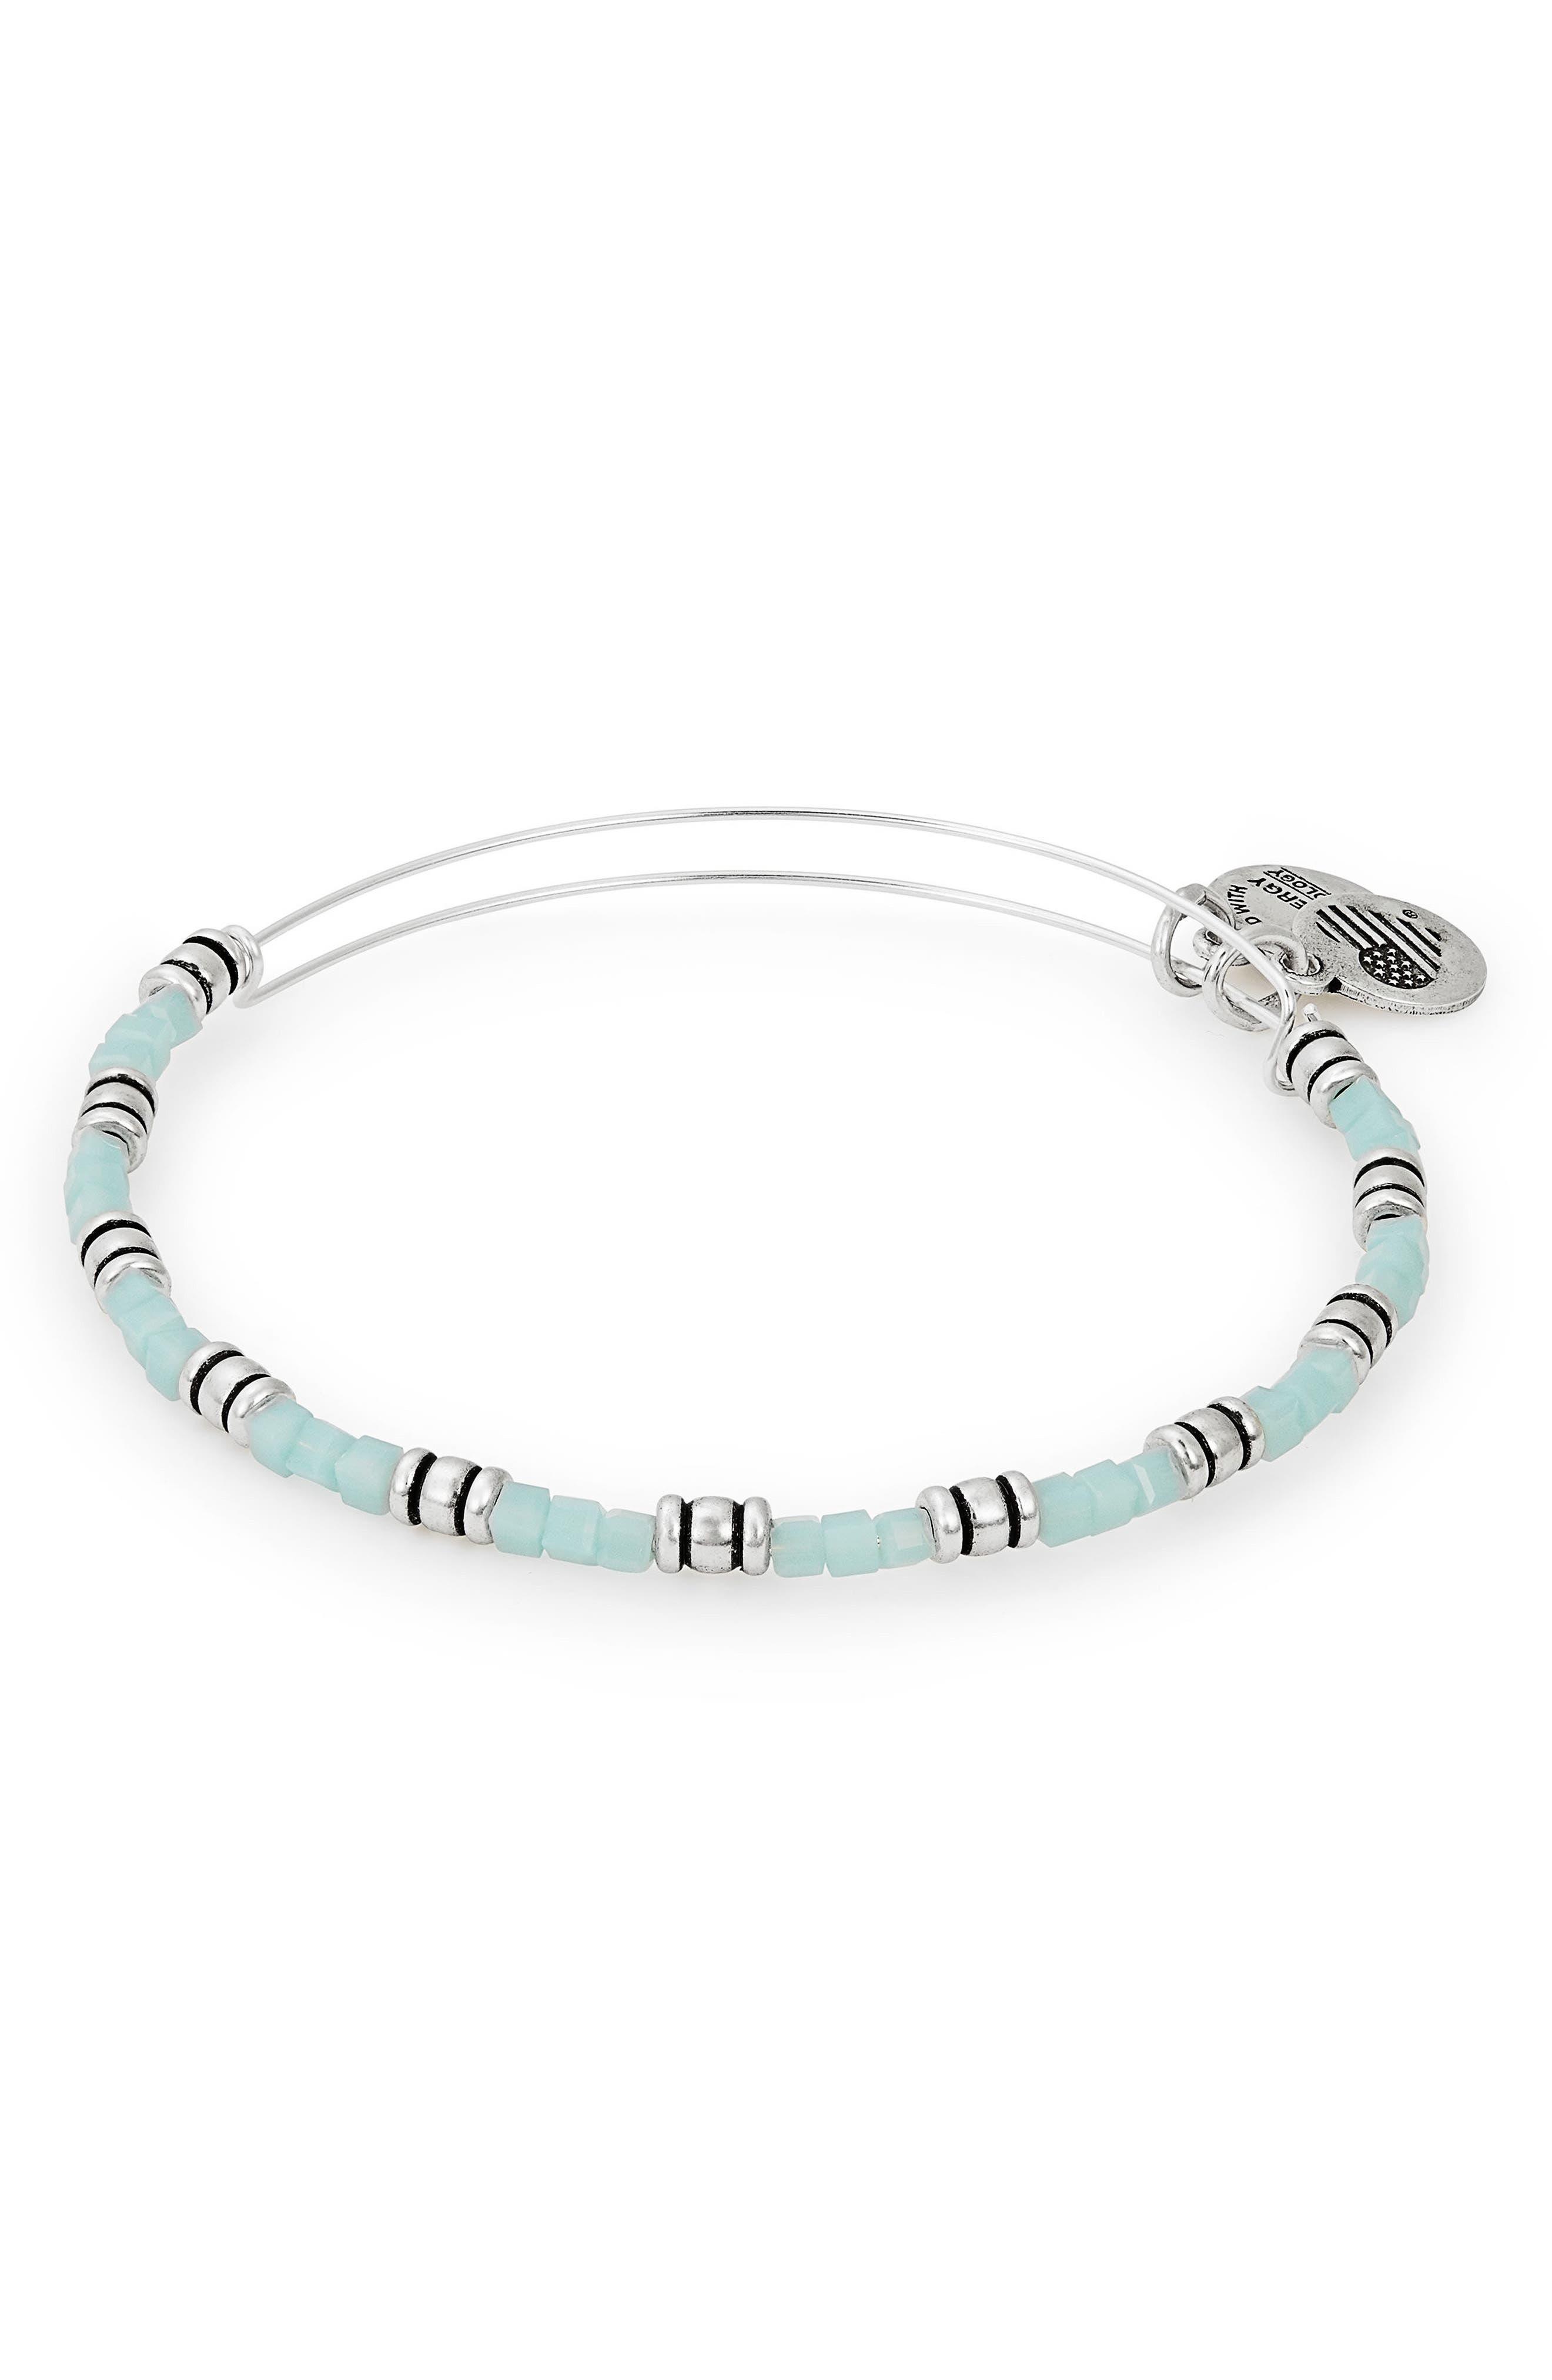 Coastal Ocean Expandable Beaded Bracelet,                         Main,                         color, 040